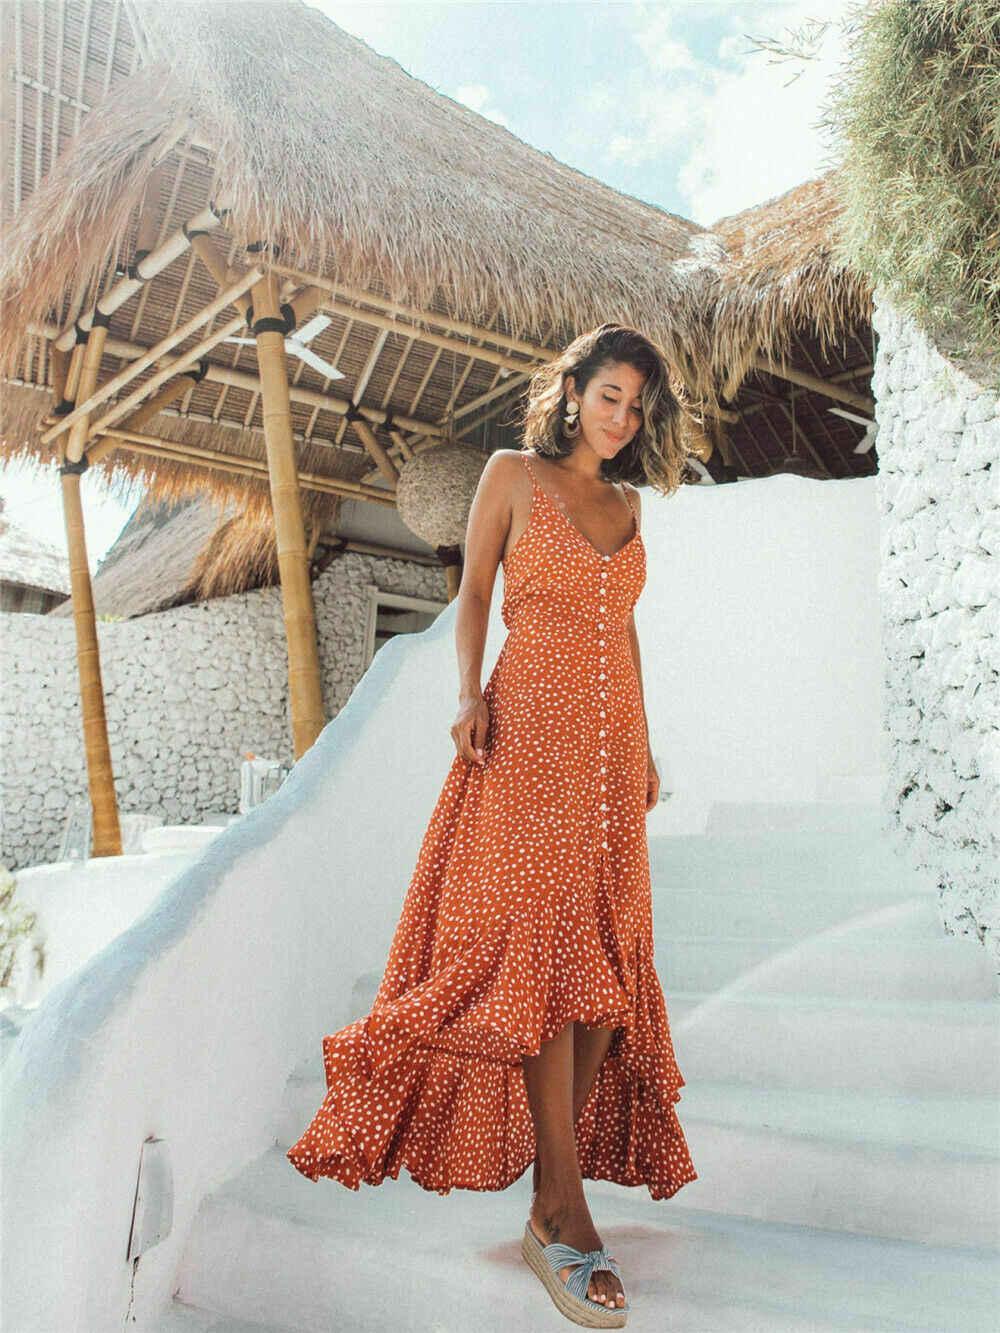 Local stock 여성 Boho 폴카 도트 섹시한 Bodycon 짧은 소매 O 넥 도트 드레스 숙녀 여름 휴가 미니 Sundress Beachwear hot